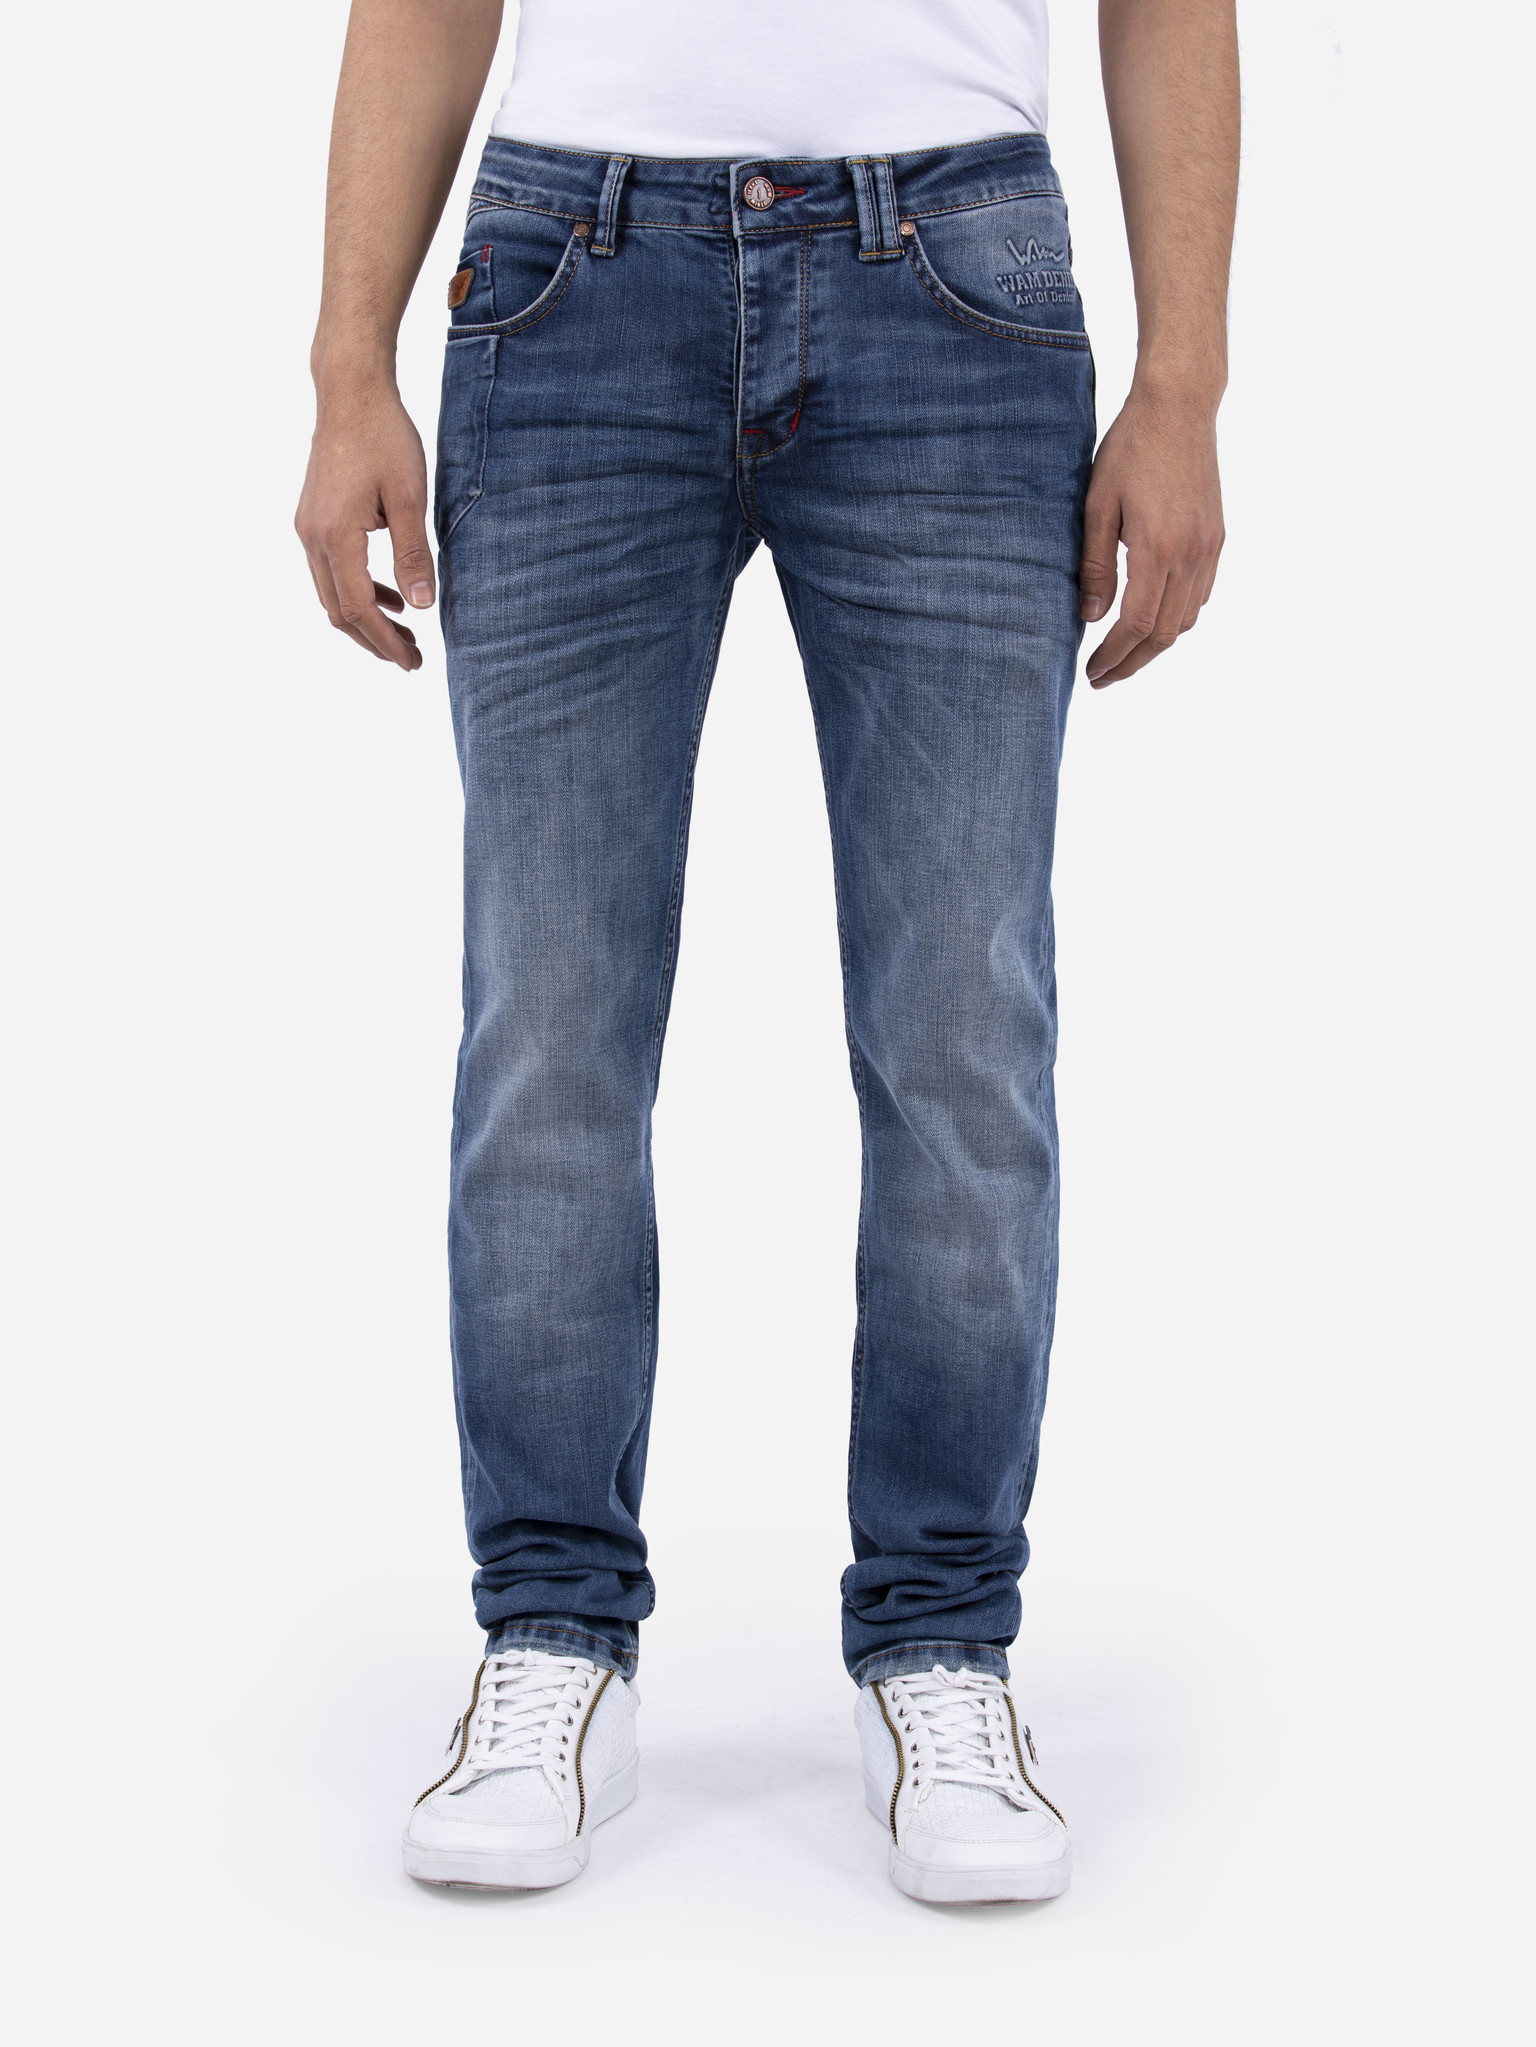 Wam Denim Jeans  wijdte: 38/32